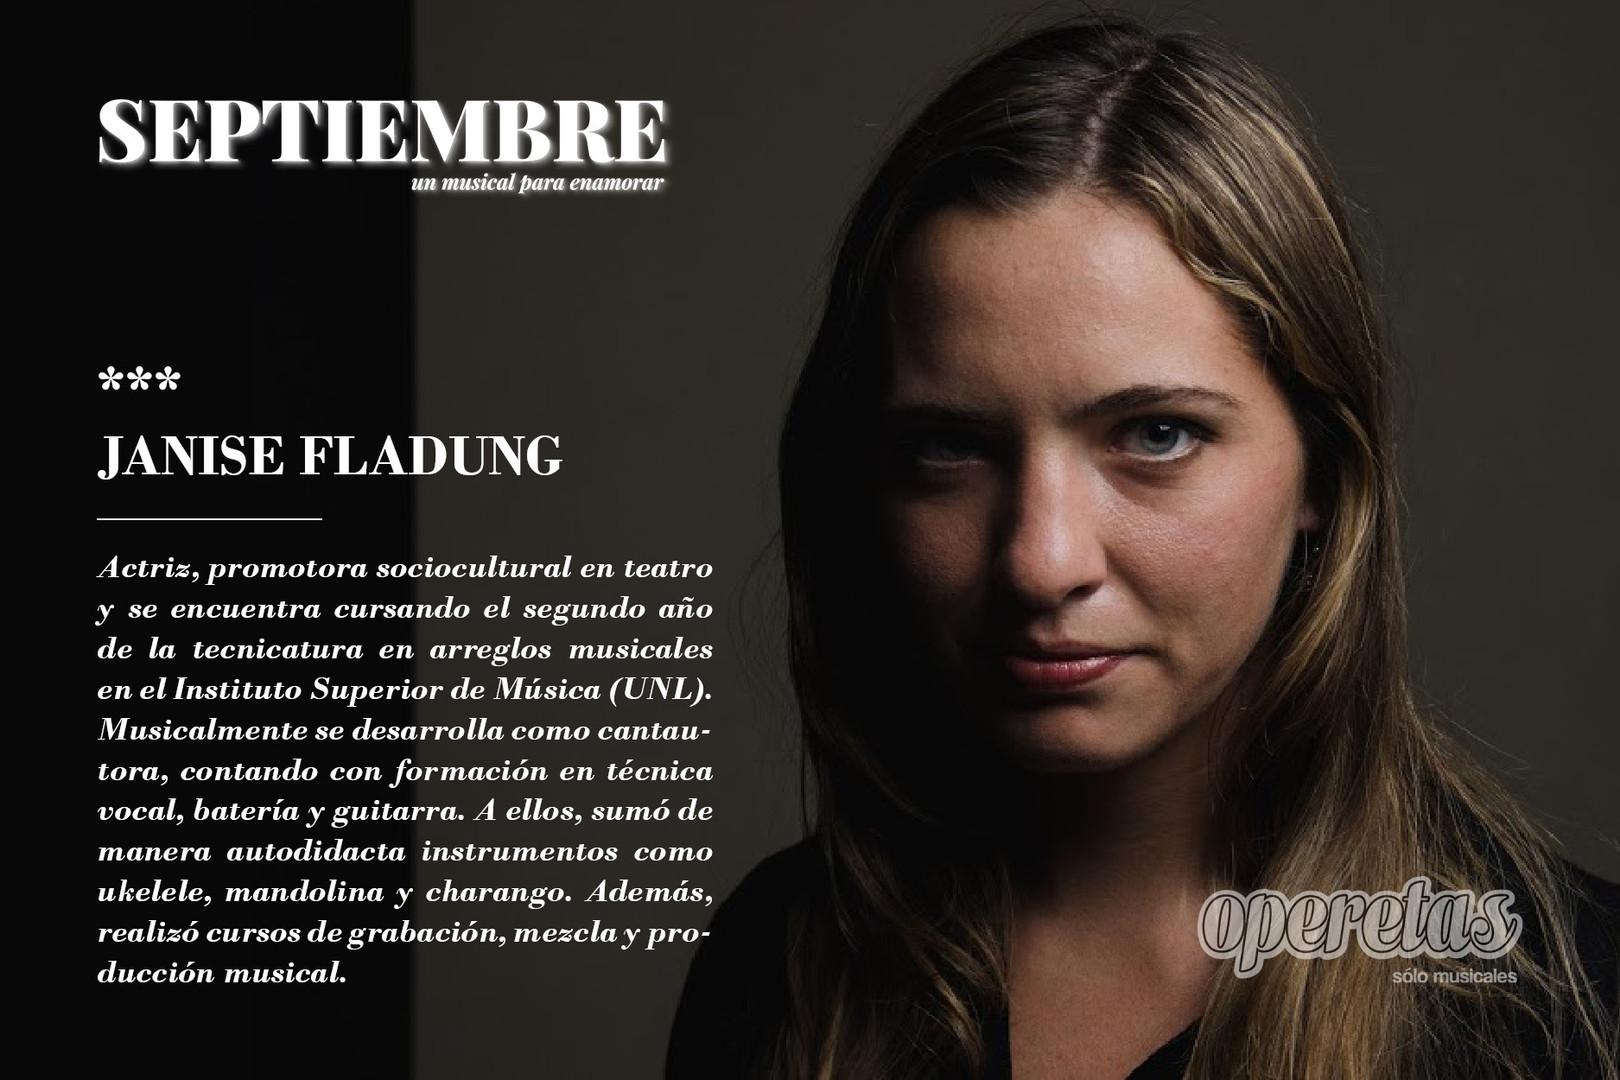 Janise Fladung